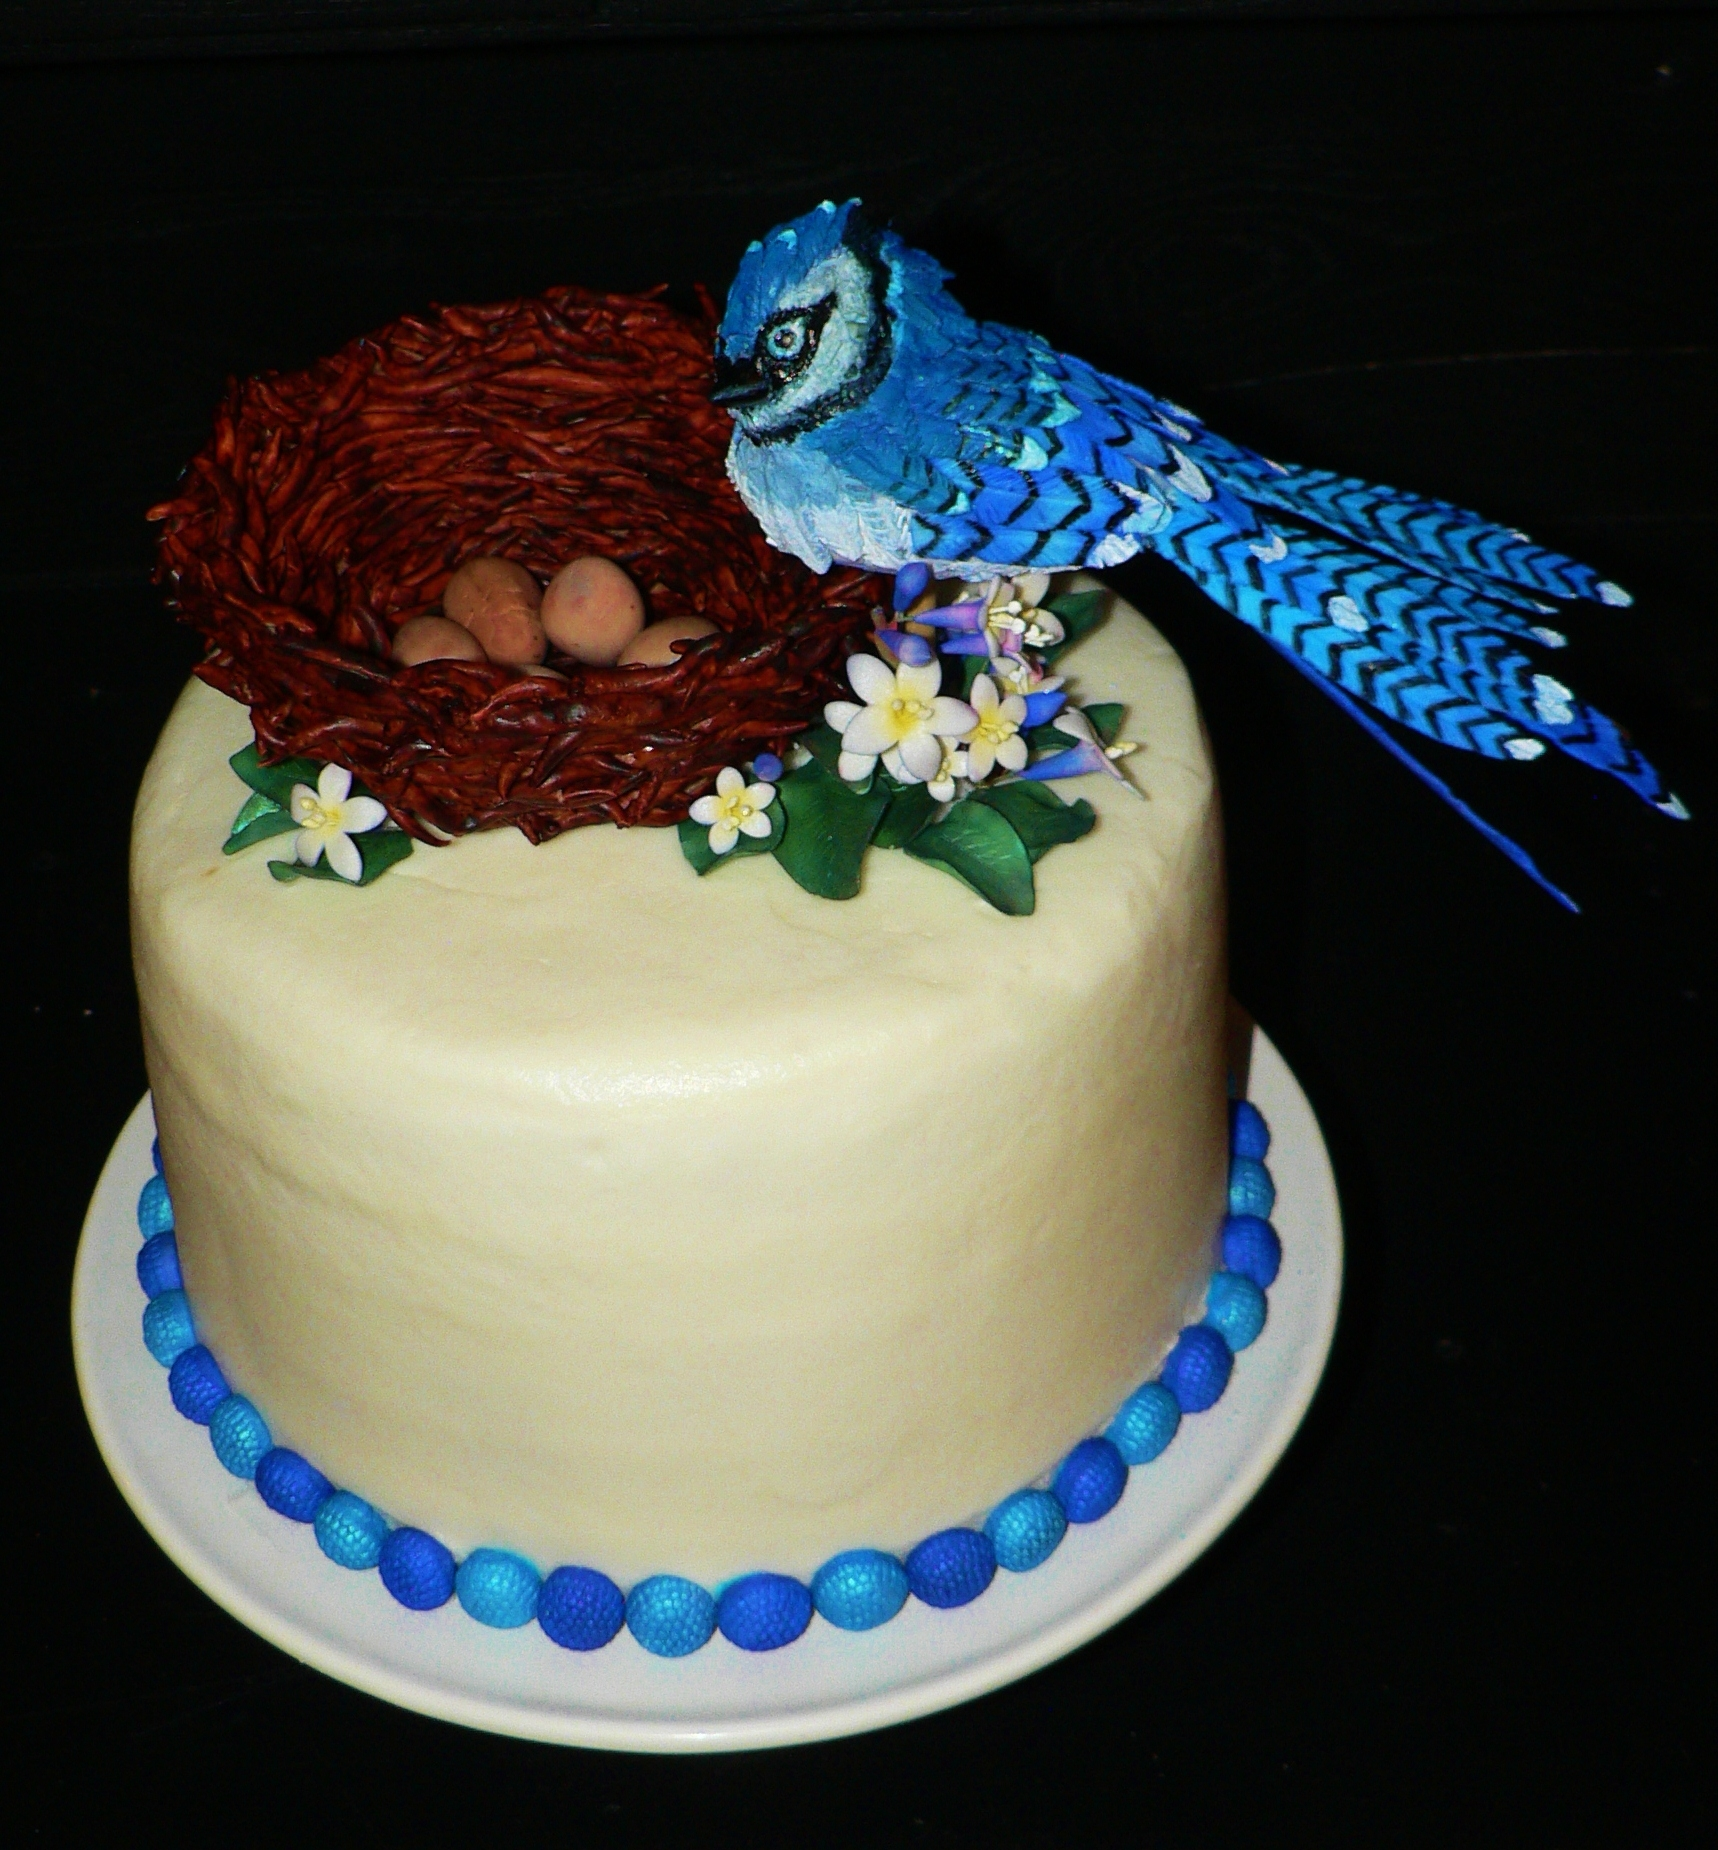 Blue Jay Birthday Cake - CakeCentral.com